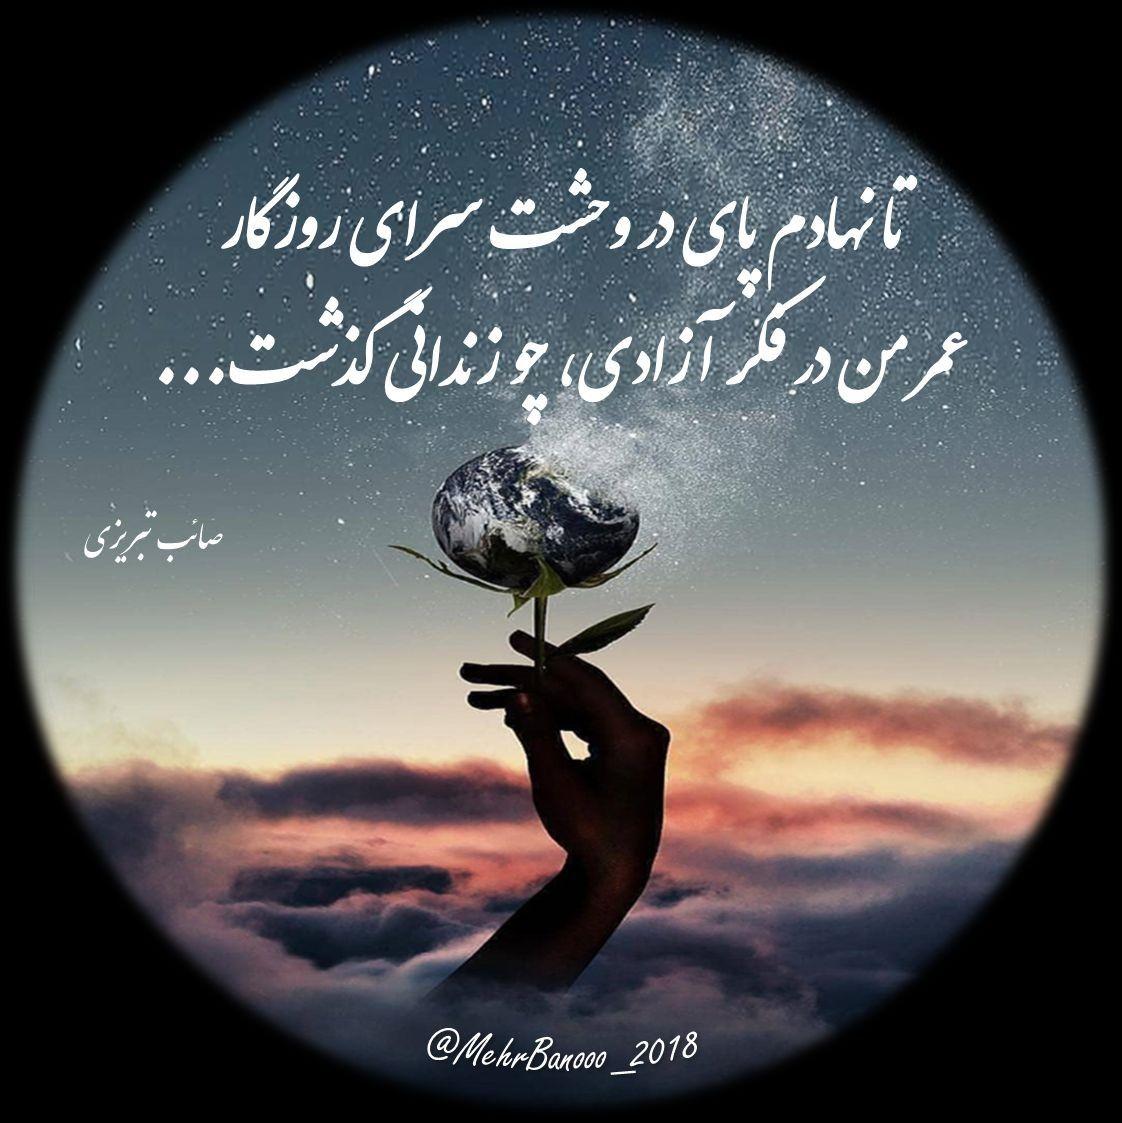 عکس نوشته عکس پروفایل شعر کانال تلگرام مهر بانو ۲۰۱۸ Mehrbanooo 2018